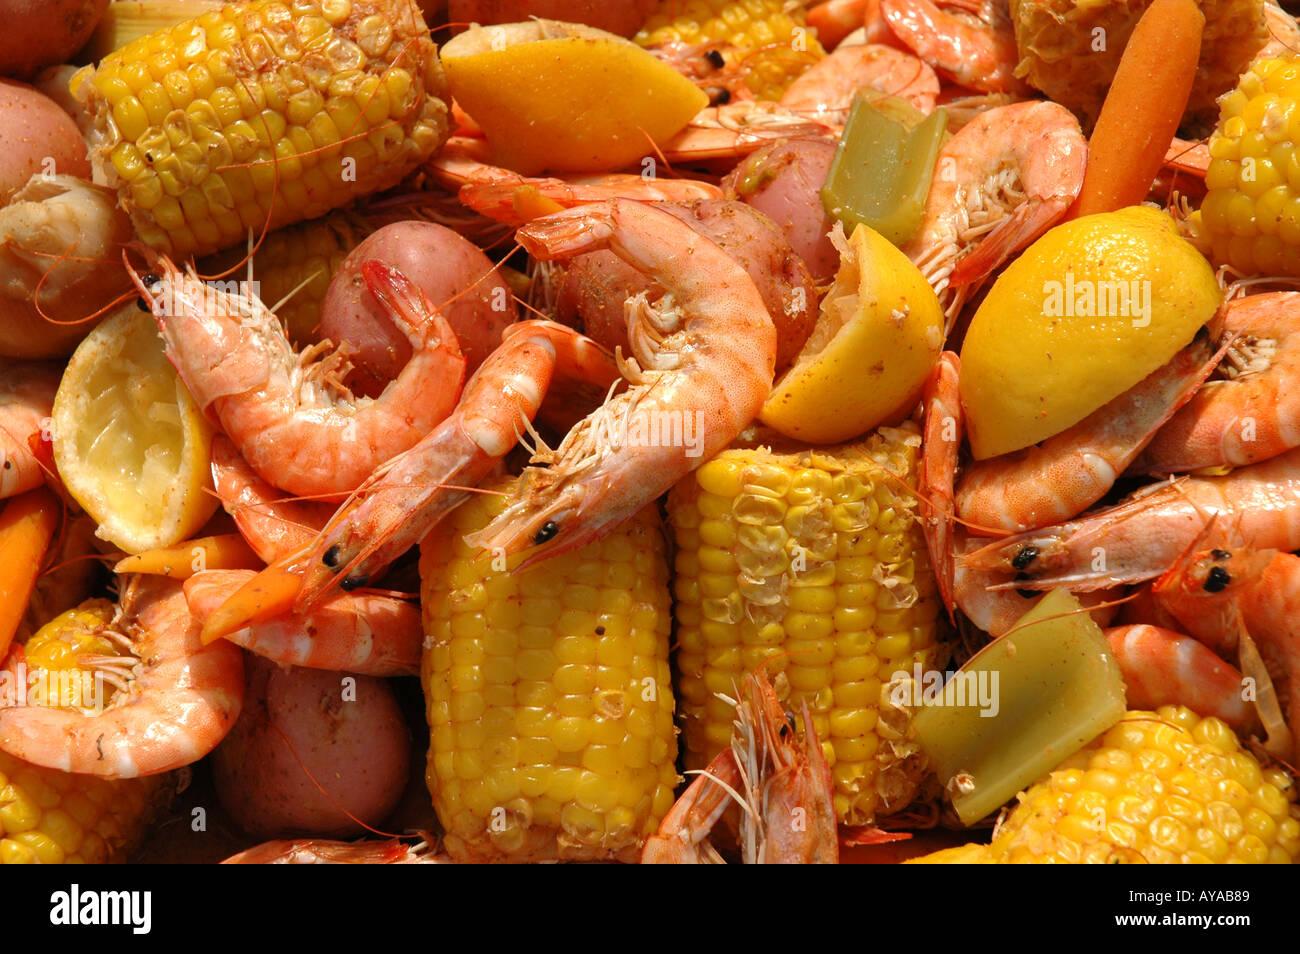 Louisiana shrimp boil Cajun cooking - Stock Image